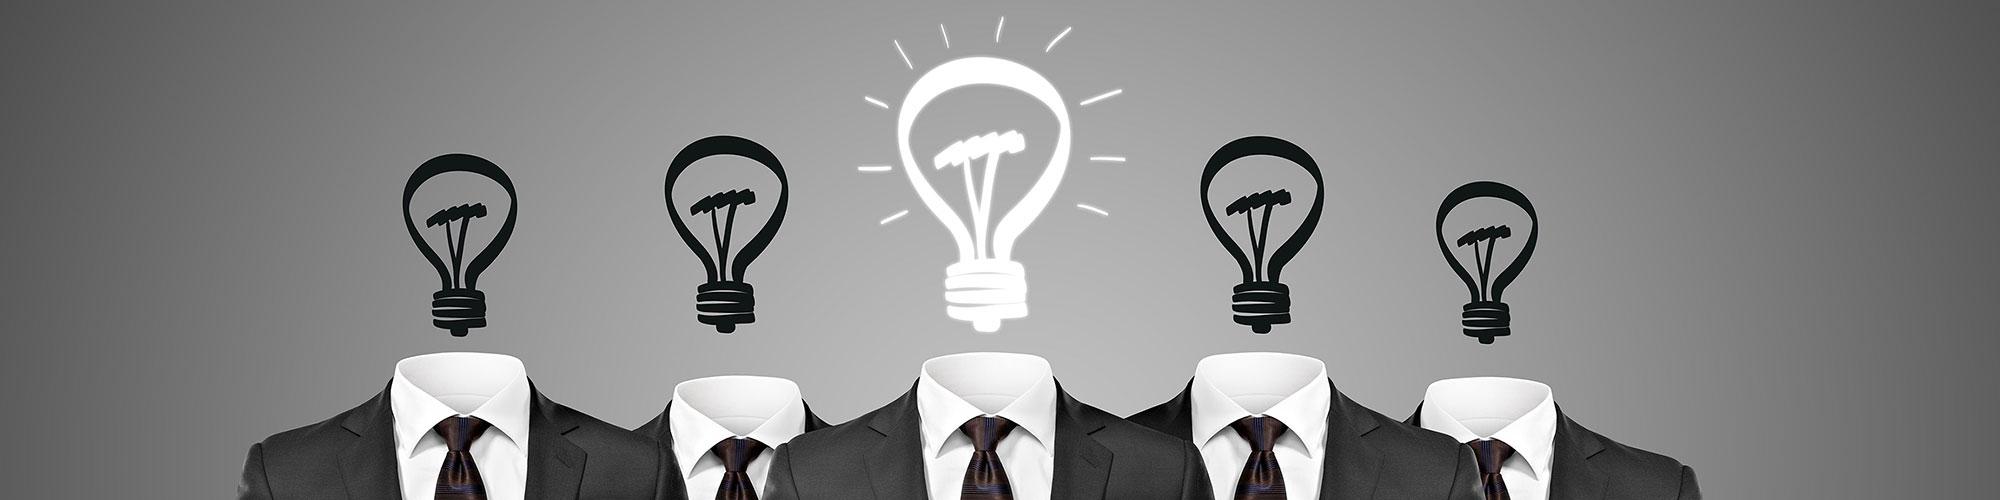 Company English Translation Ideas Light Bulbs